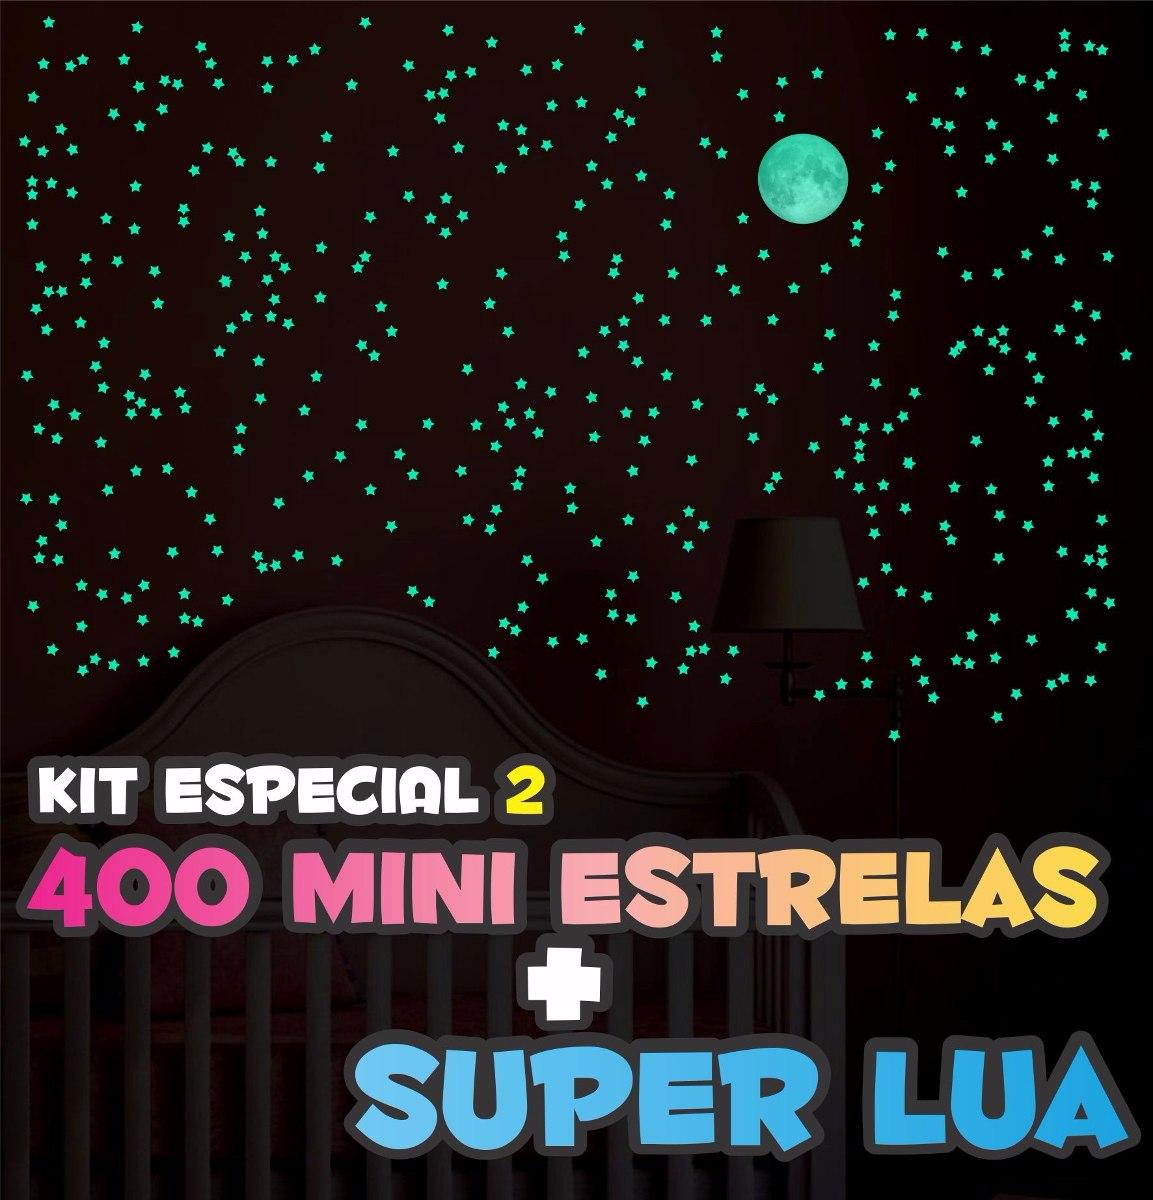 6a923f5c1 400 mini estrelas que brilham no escuro + super lua. Carregando zoom.